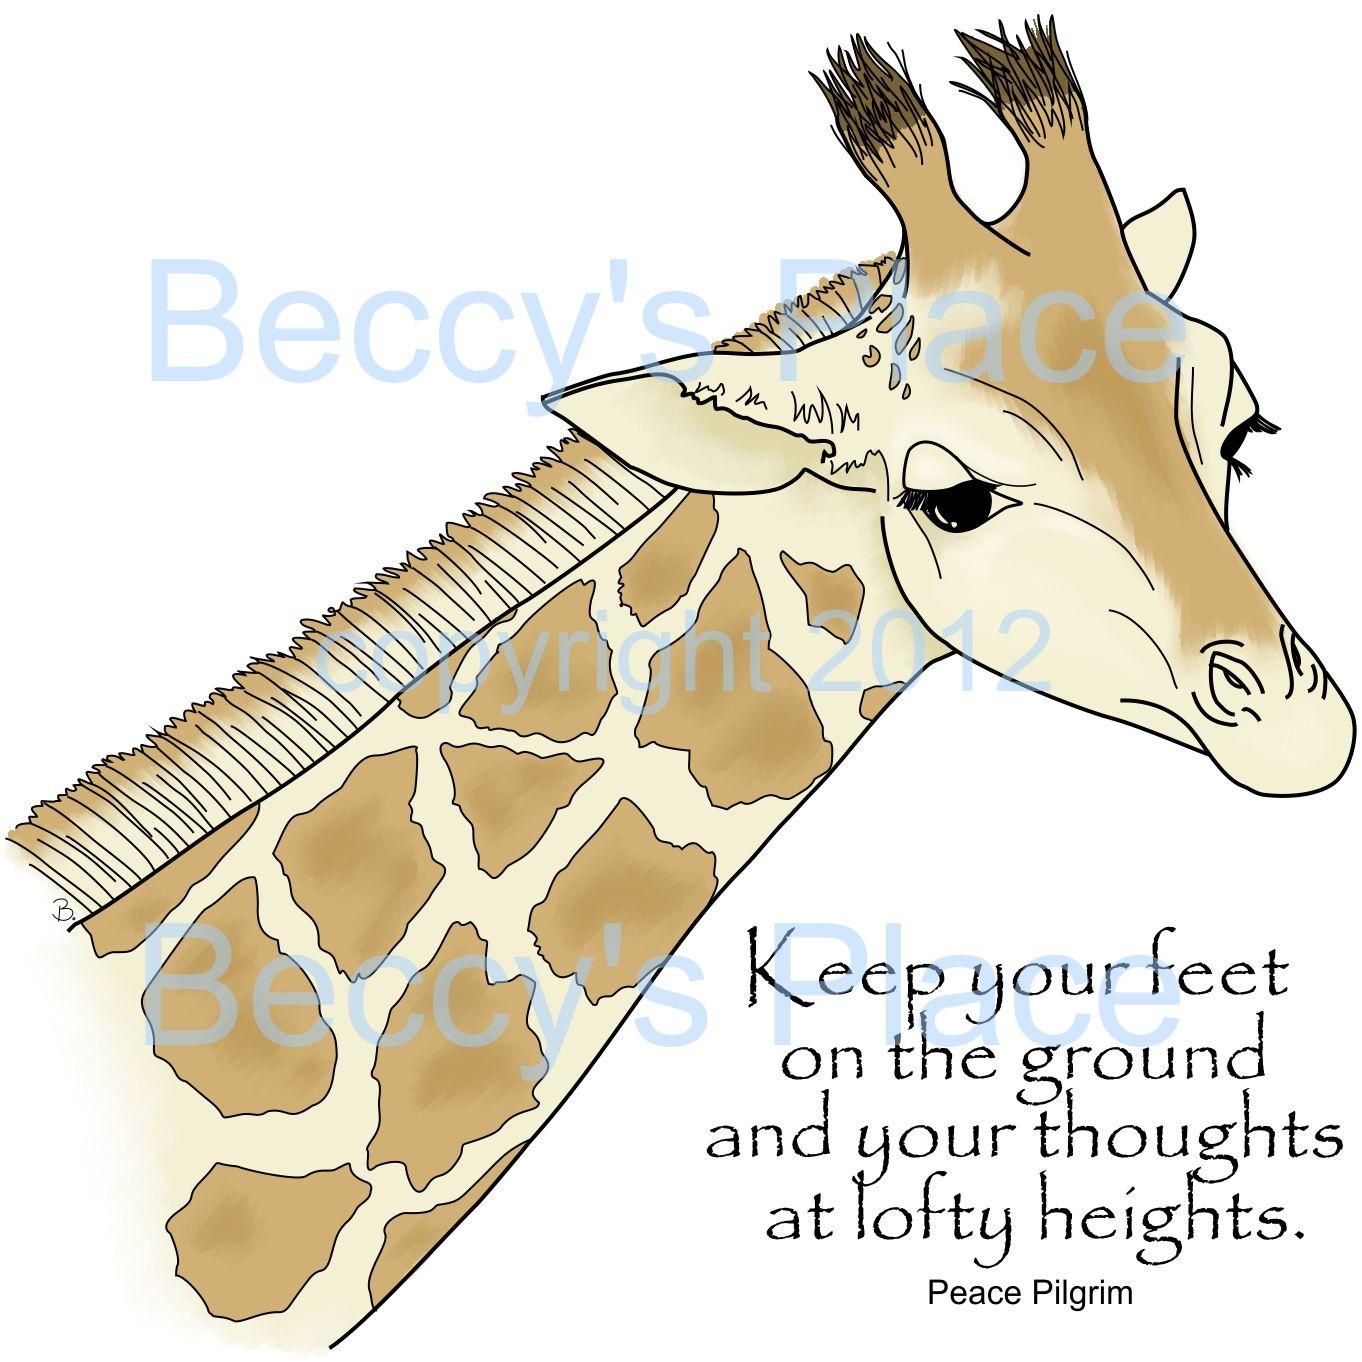 Giraffe Quotes Funny: Funny Giraffe Quotes